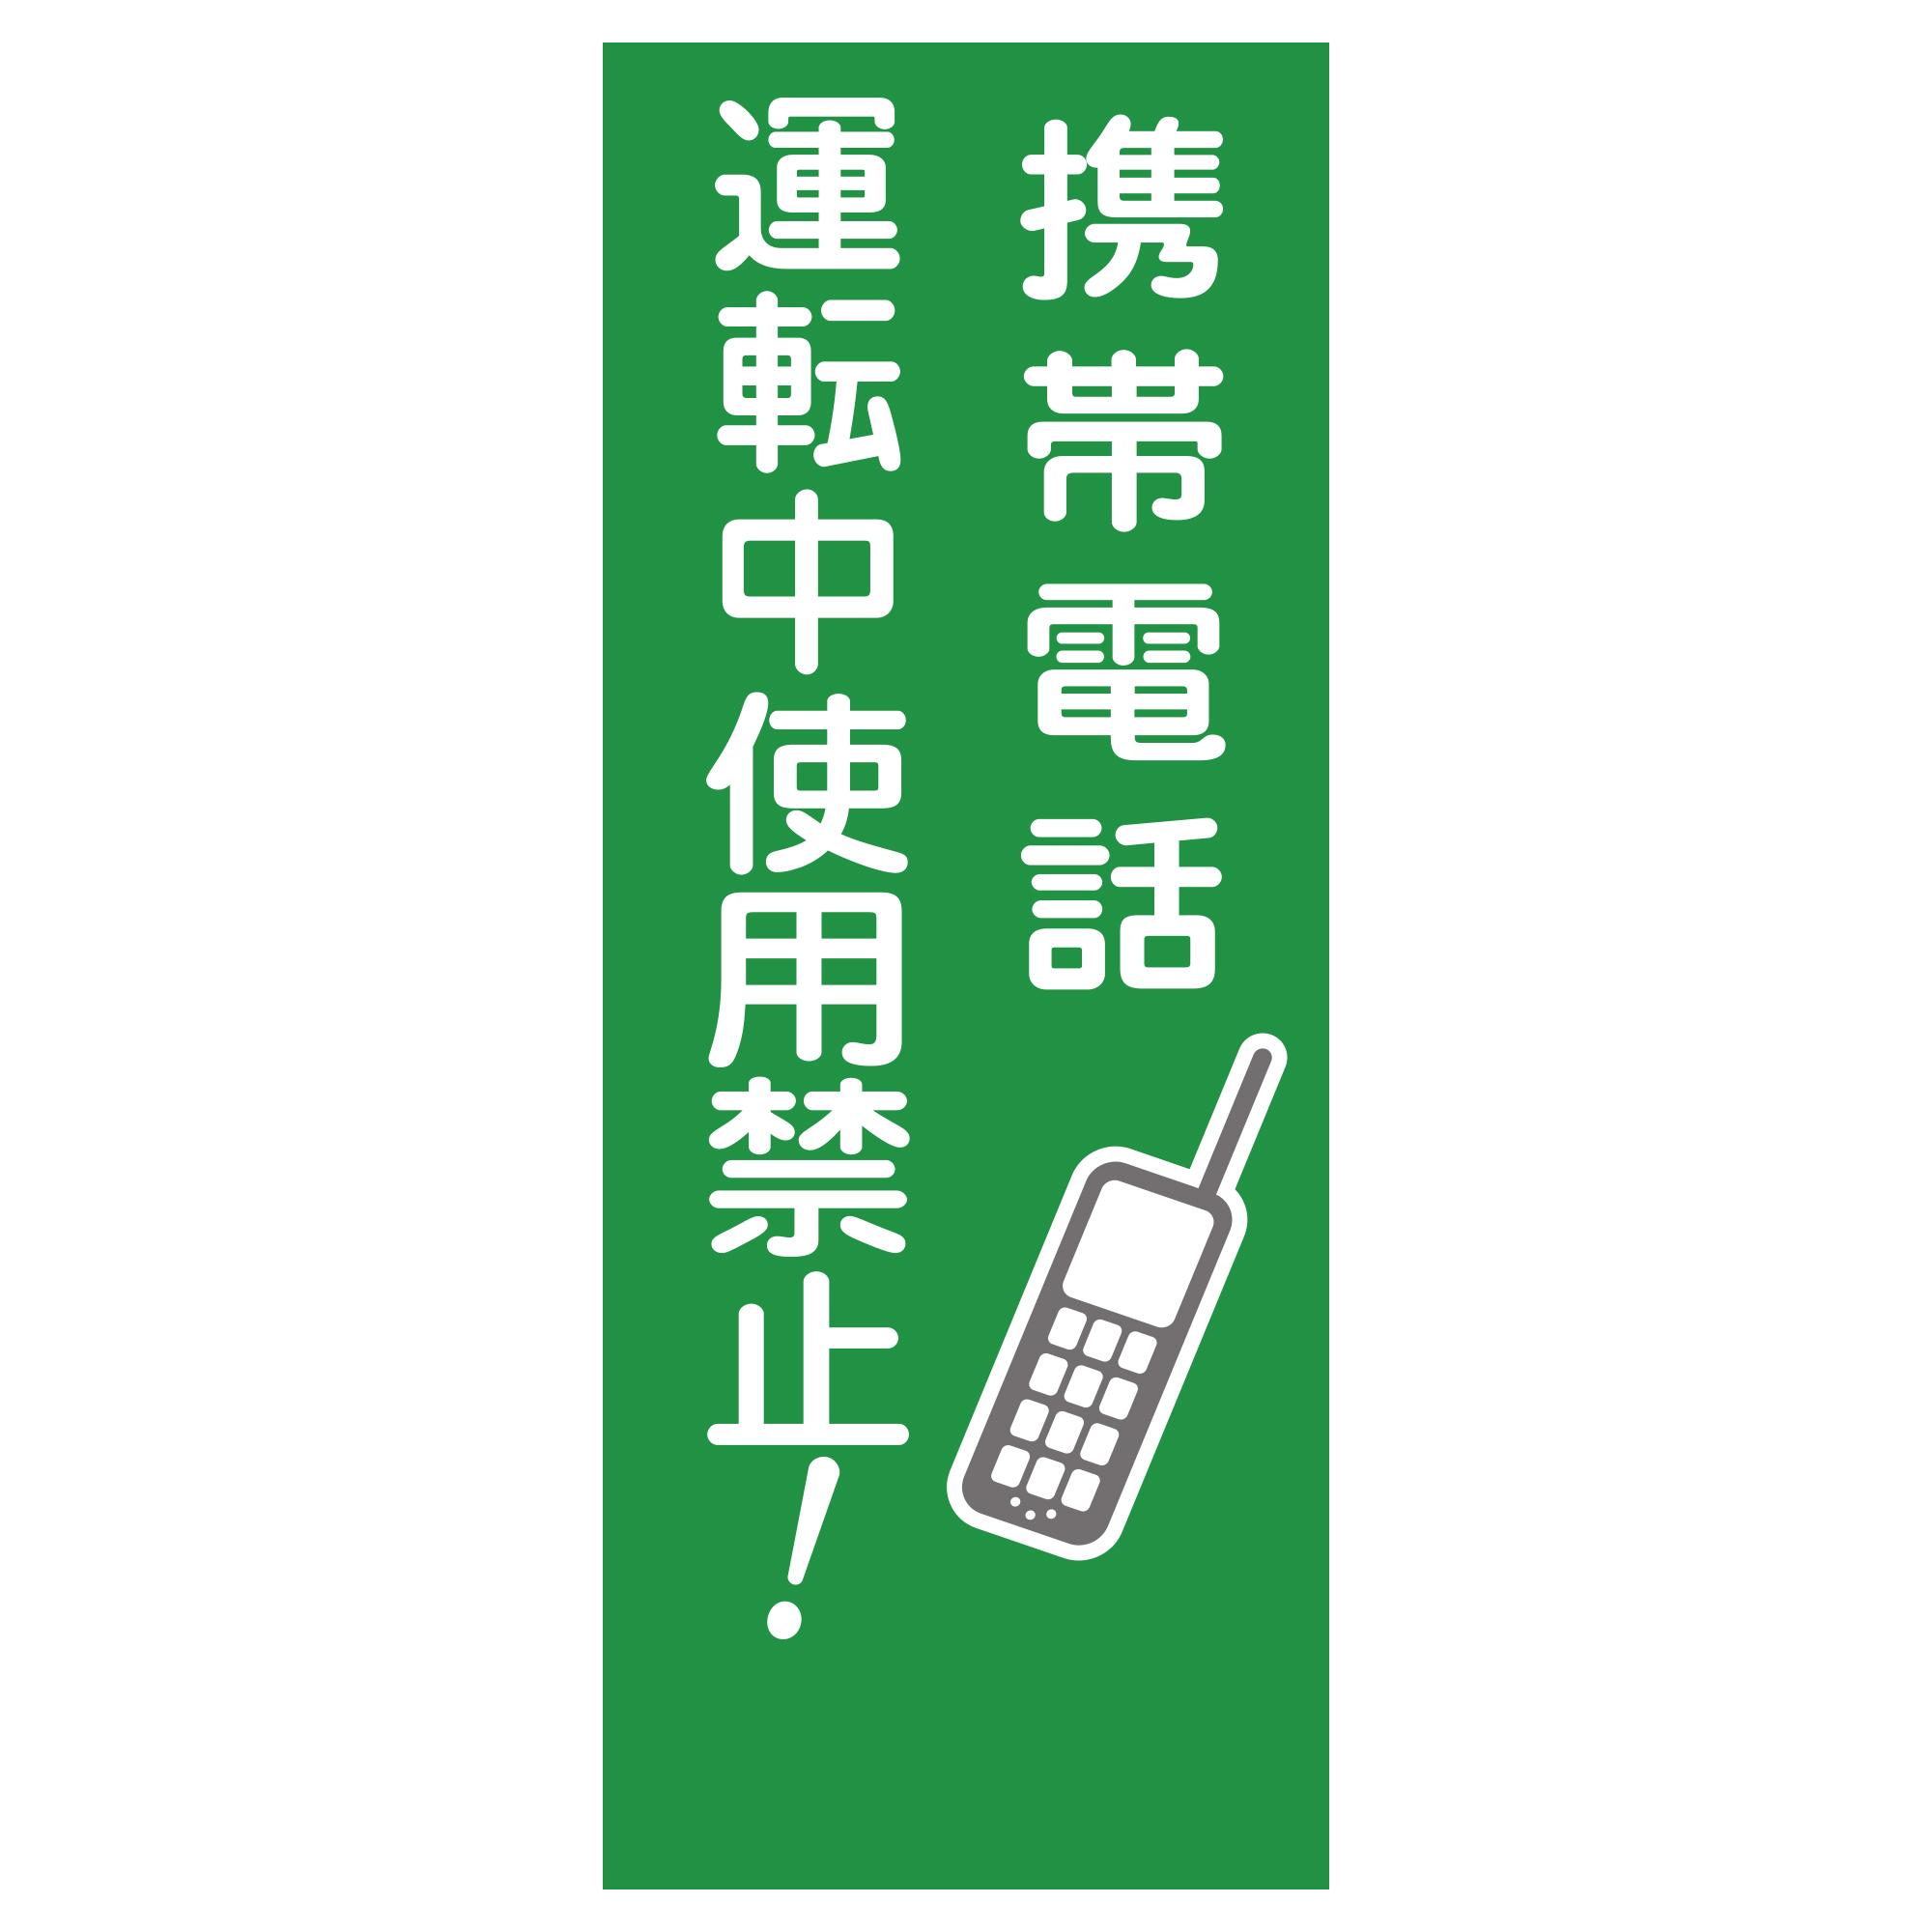 SL用標語看板カバー№2 携帯電話運転中禁止